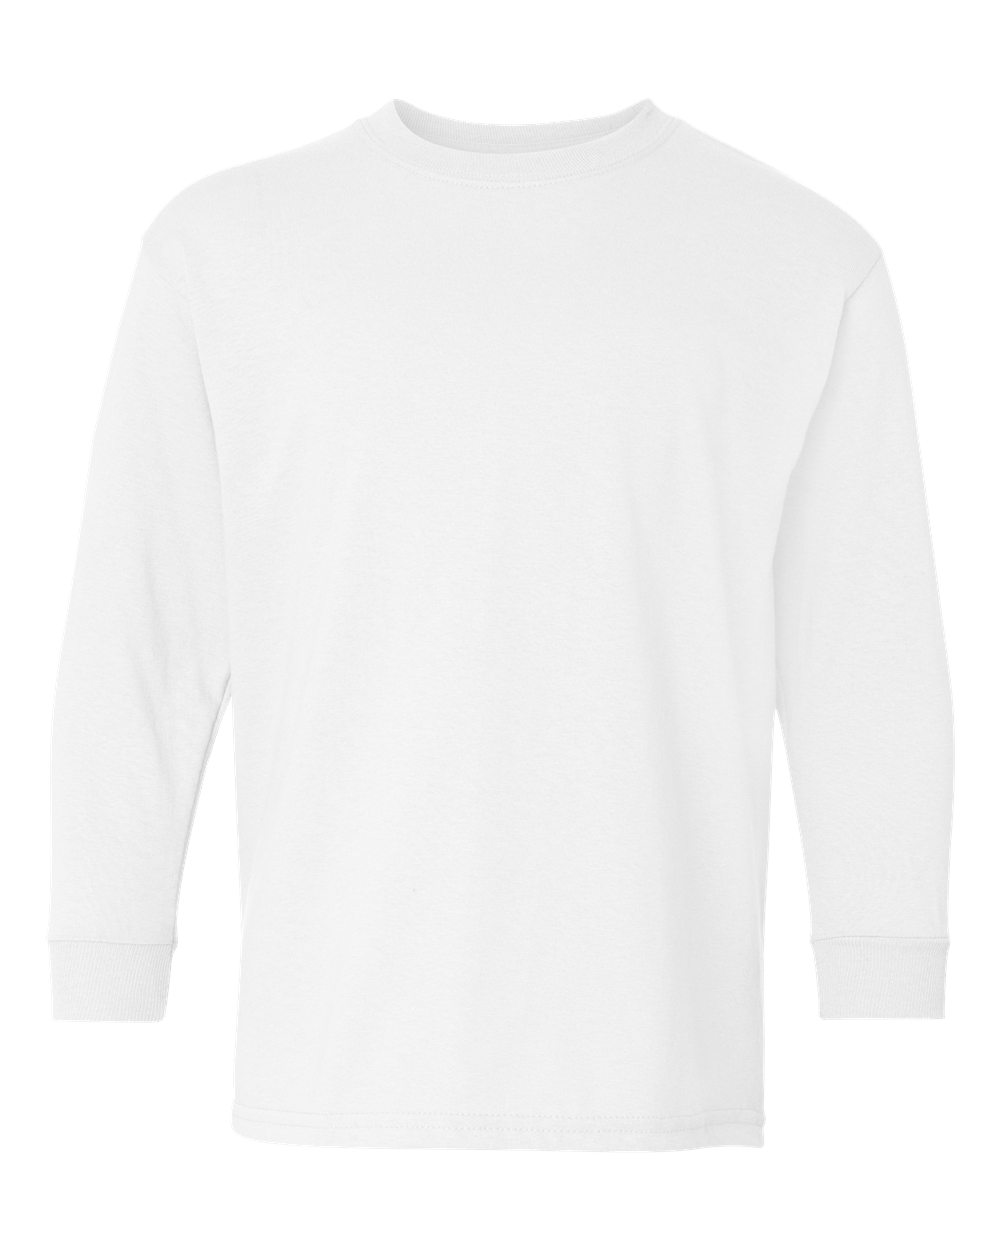 51edea45 Gildan 5400B - Youth Heavy Cotton Long Sleeve T-Shirt | Needen USA